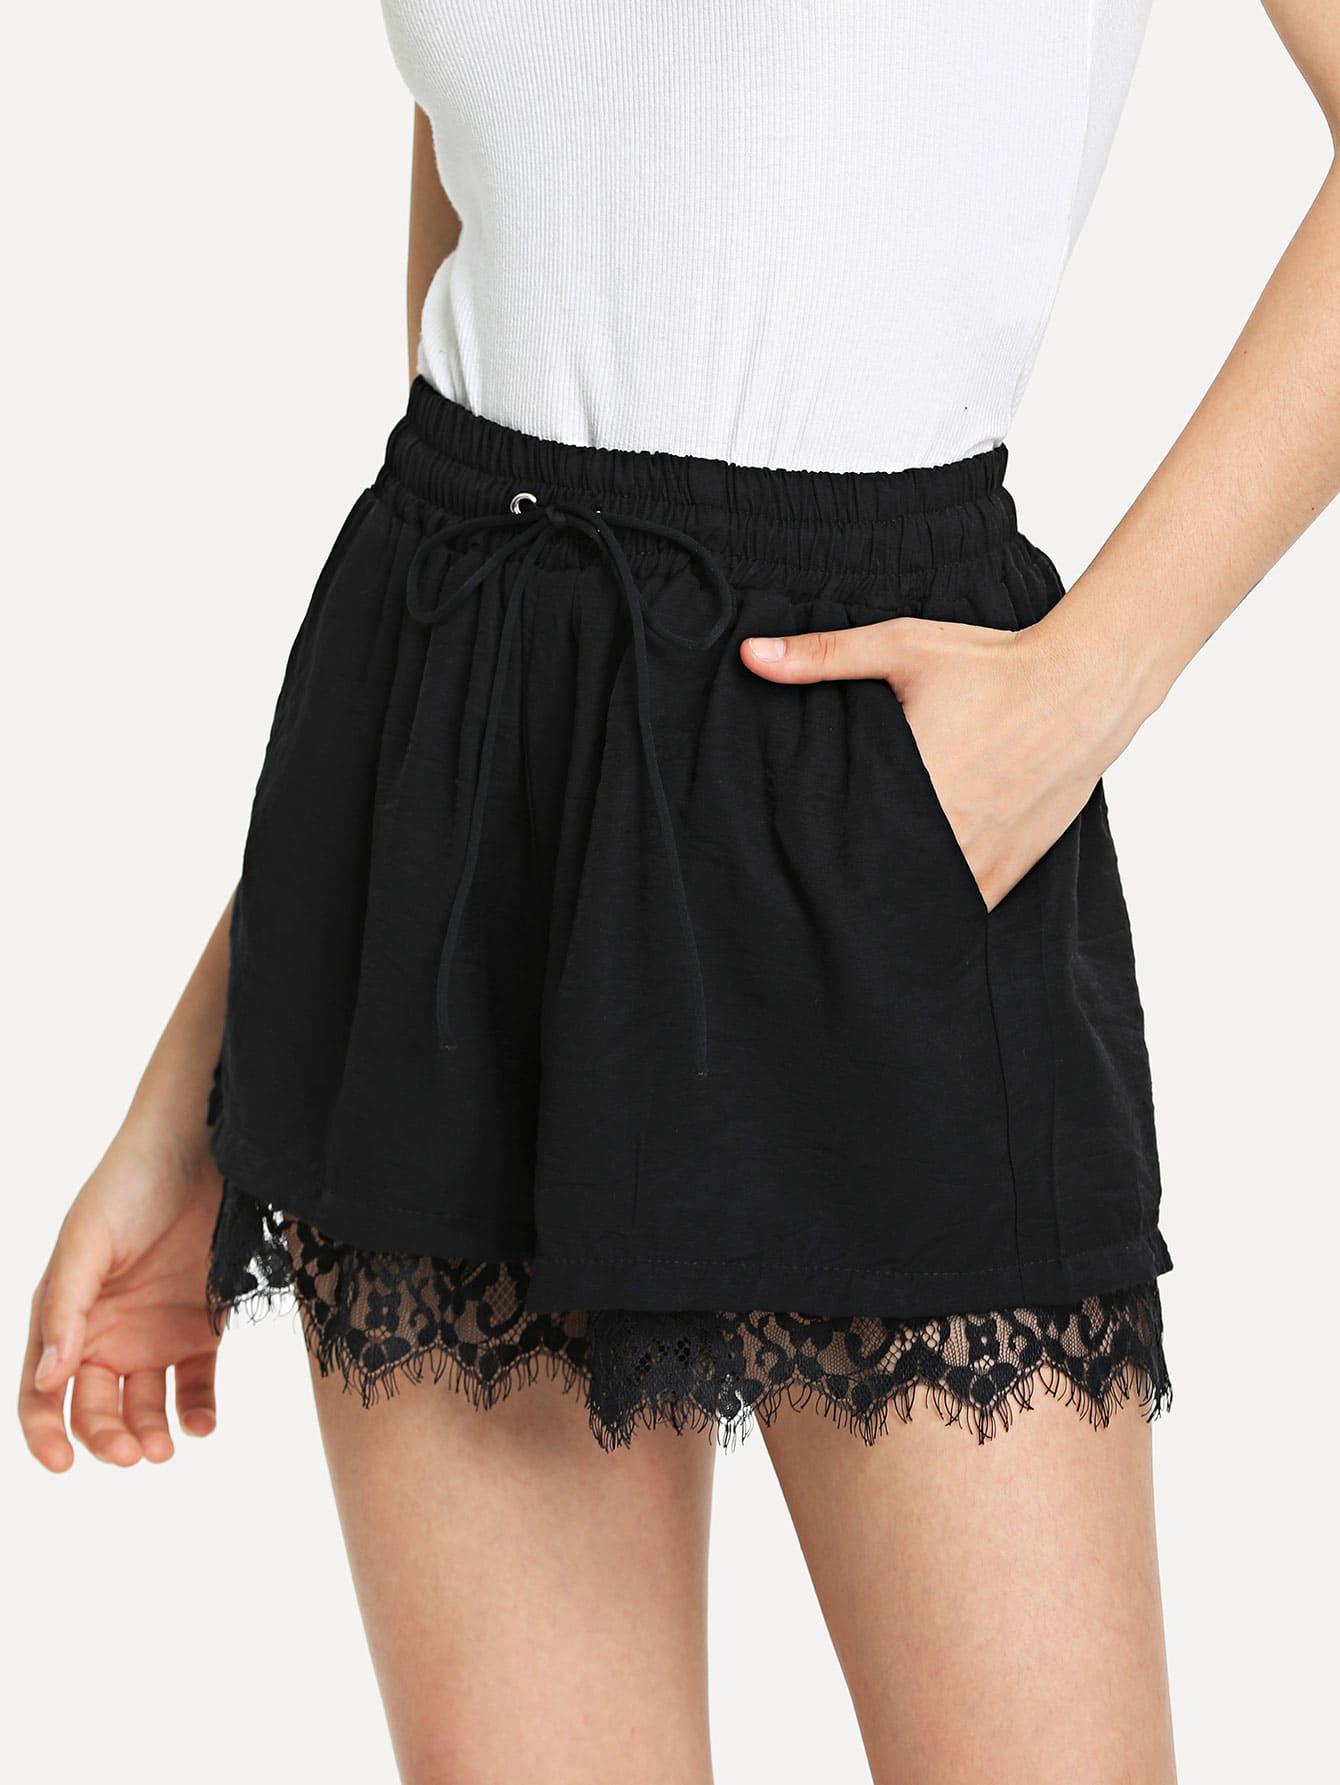 H M - Choose Your Region Black lace shorts fashion